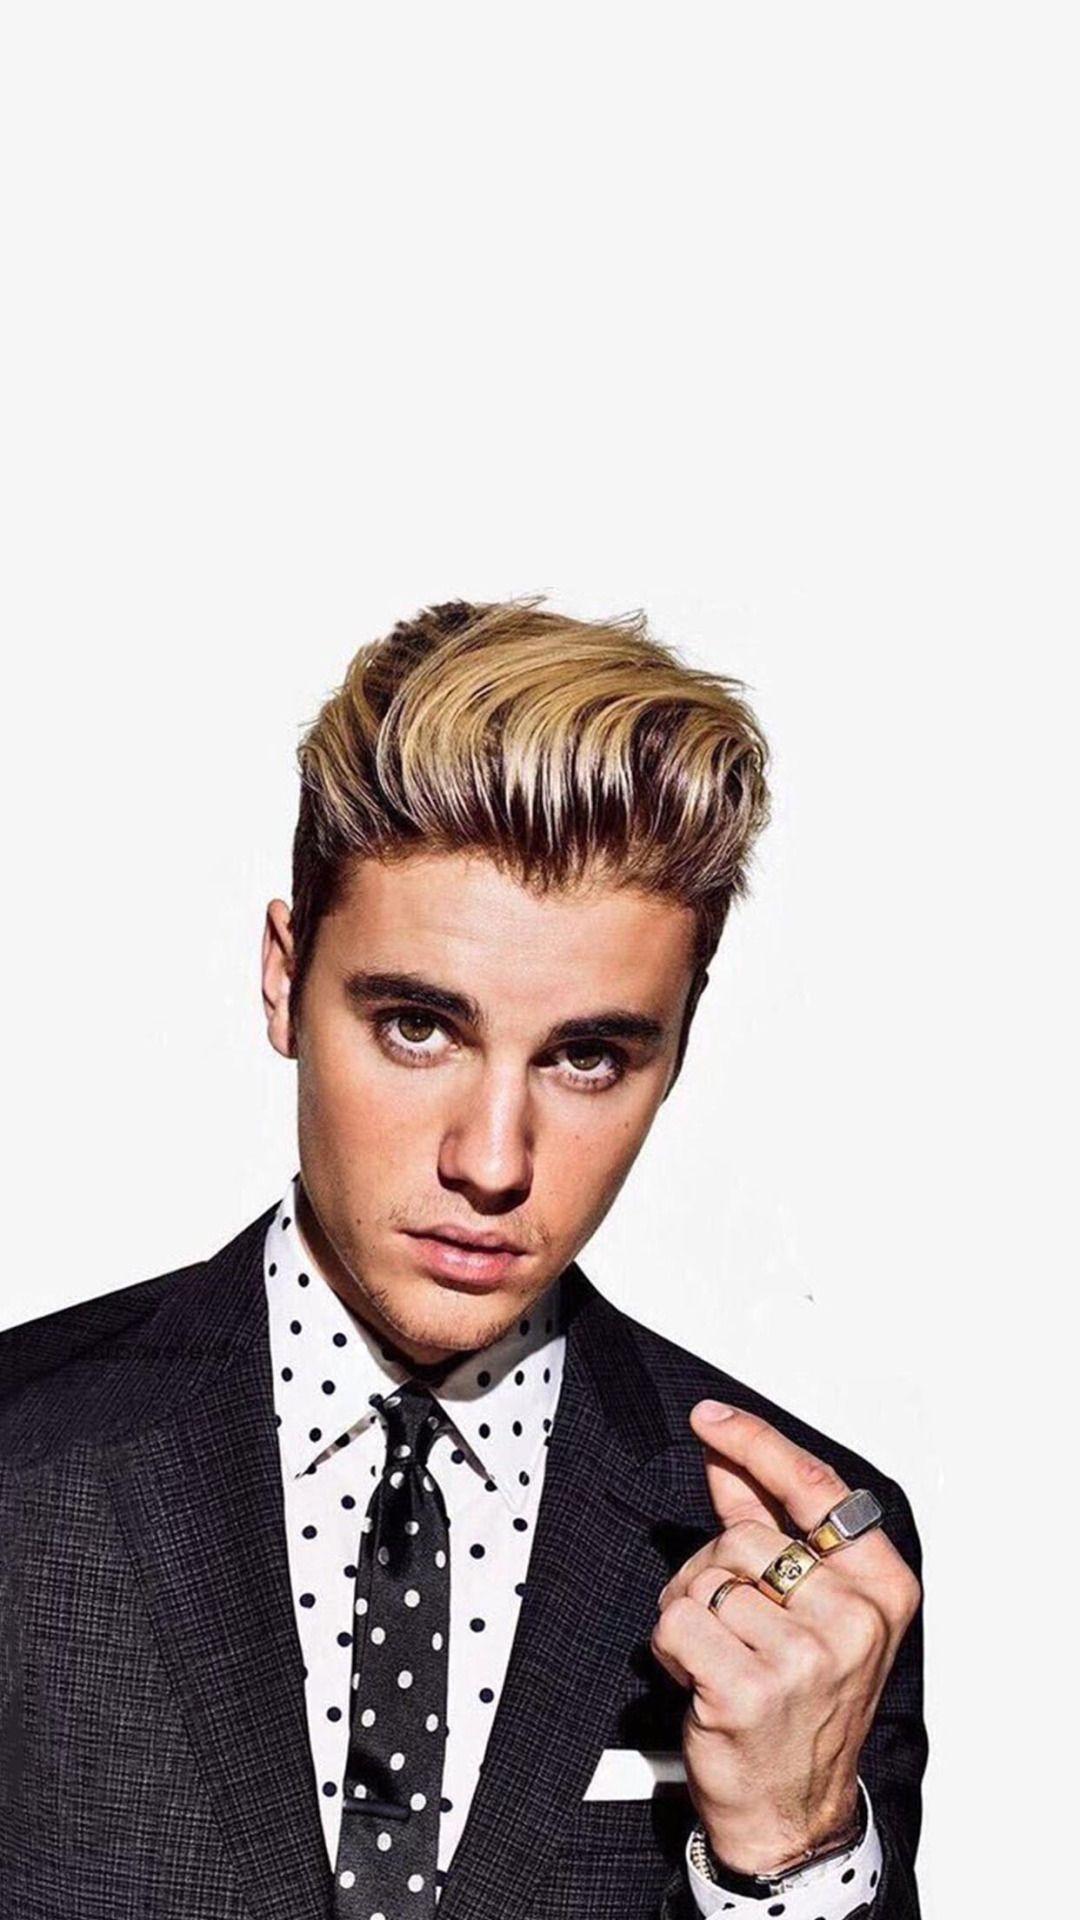 Justin Bieber Iphone Wallpaper 64 Images